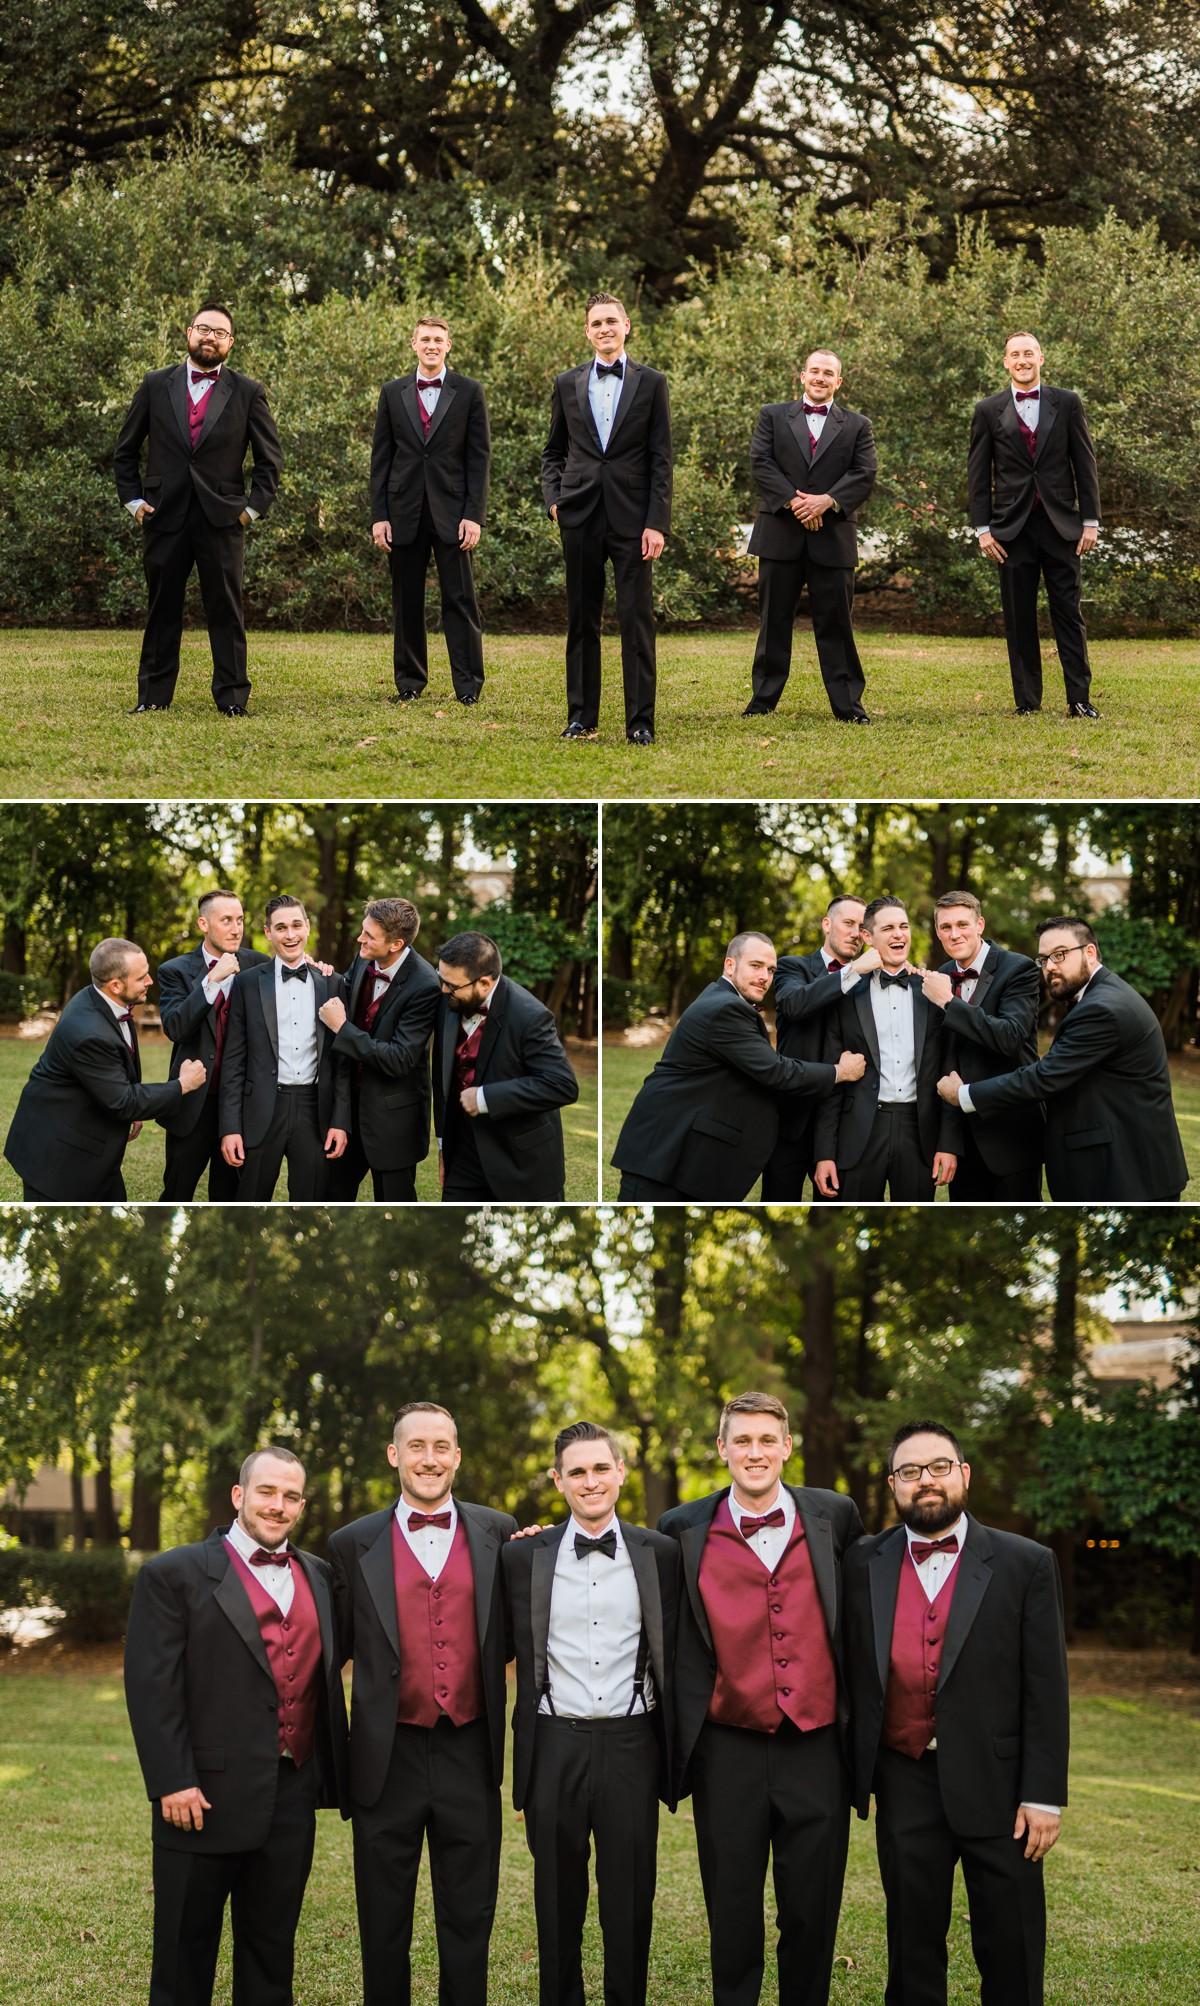 Manor House Wedding at The Houstonian Hotel Groomsman outdoors